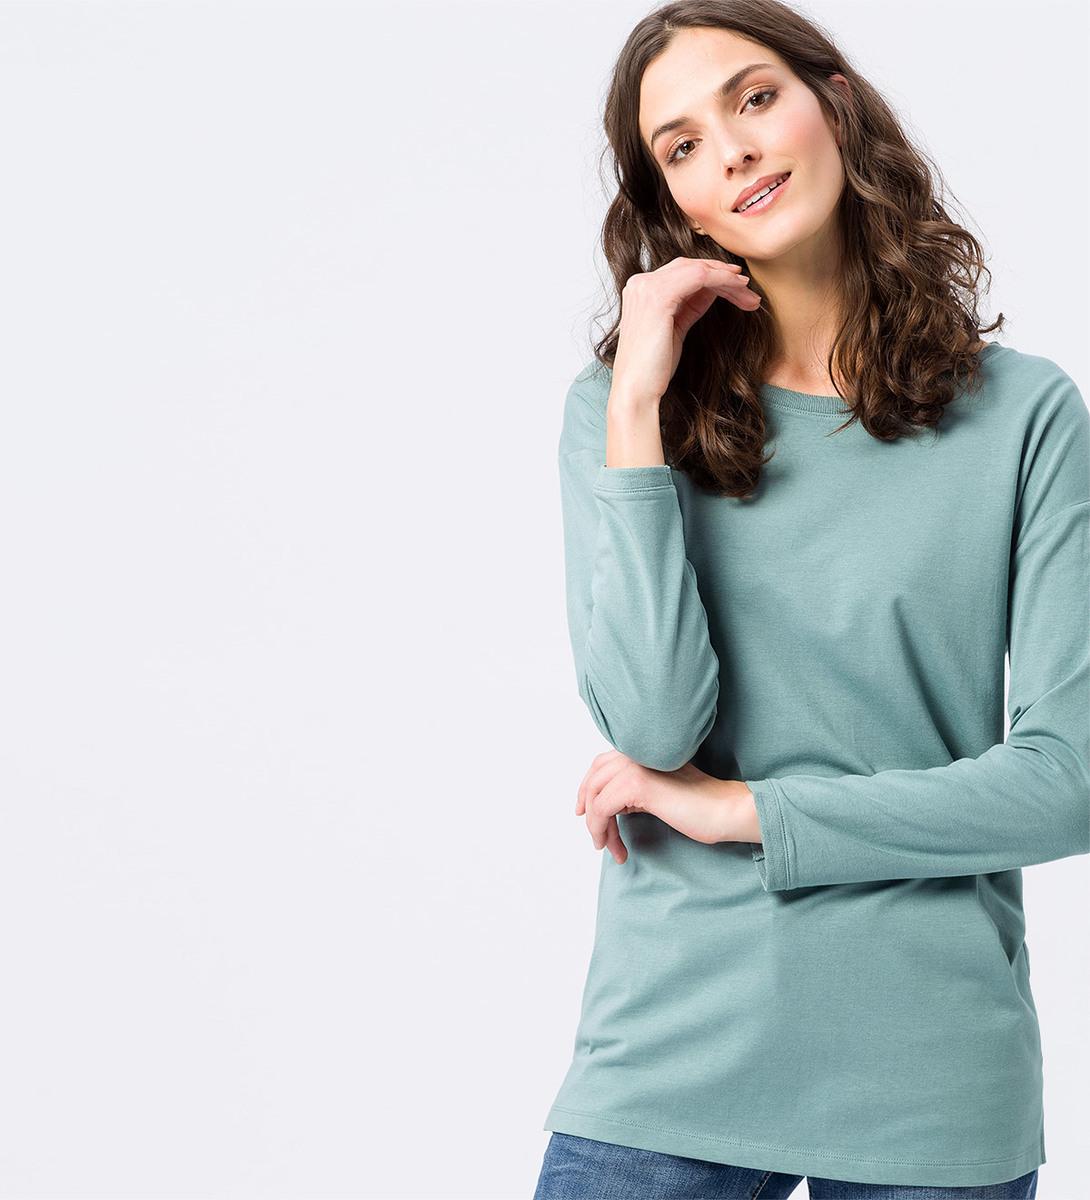 Shirt im unifarbenen Design in dusk jade